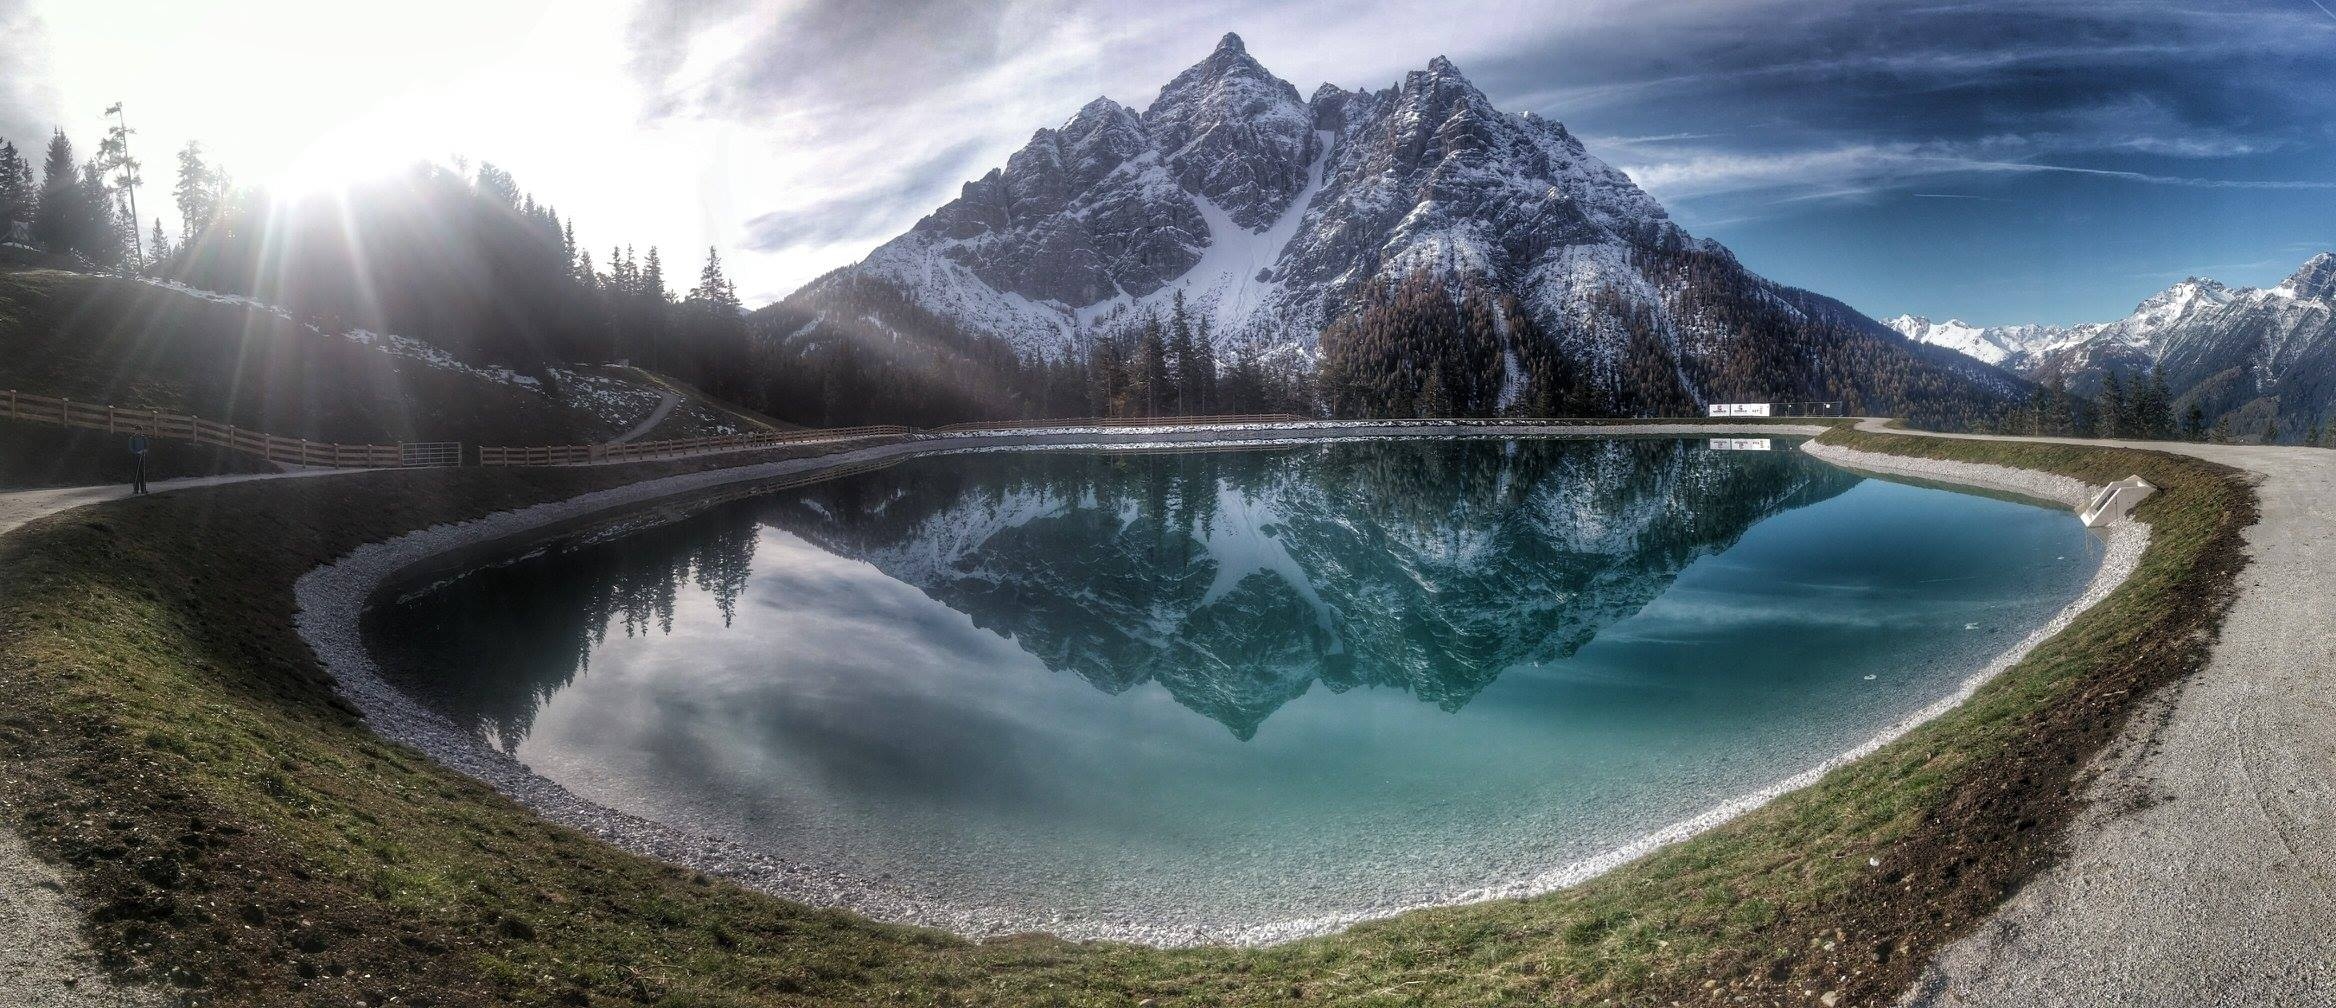 Serles | Doug's Mountain Getaway